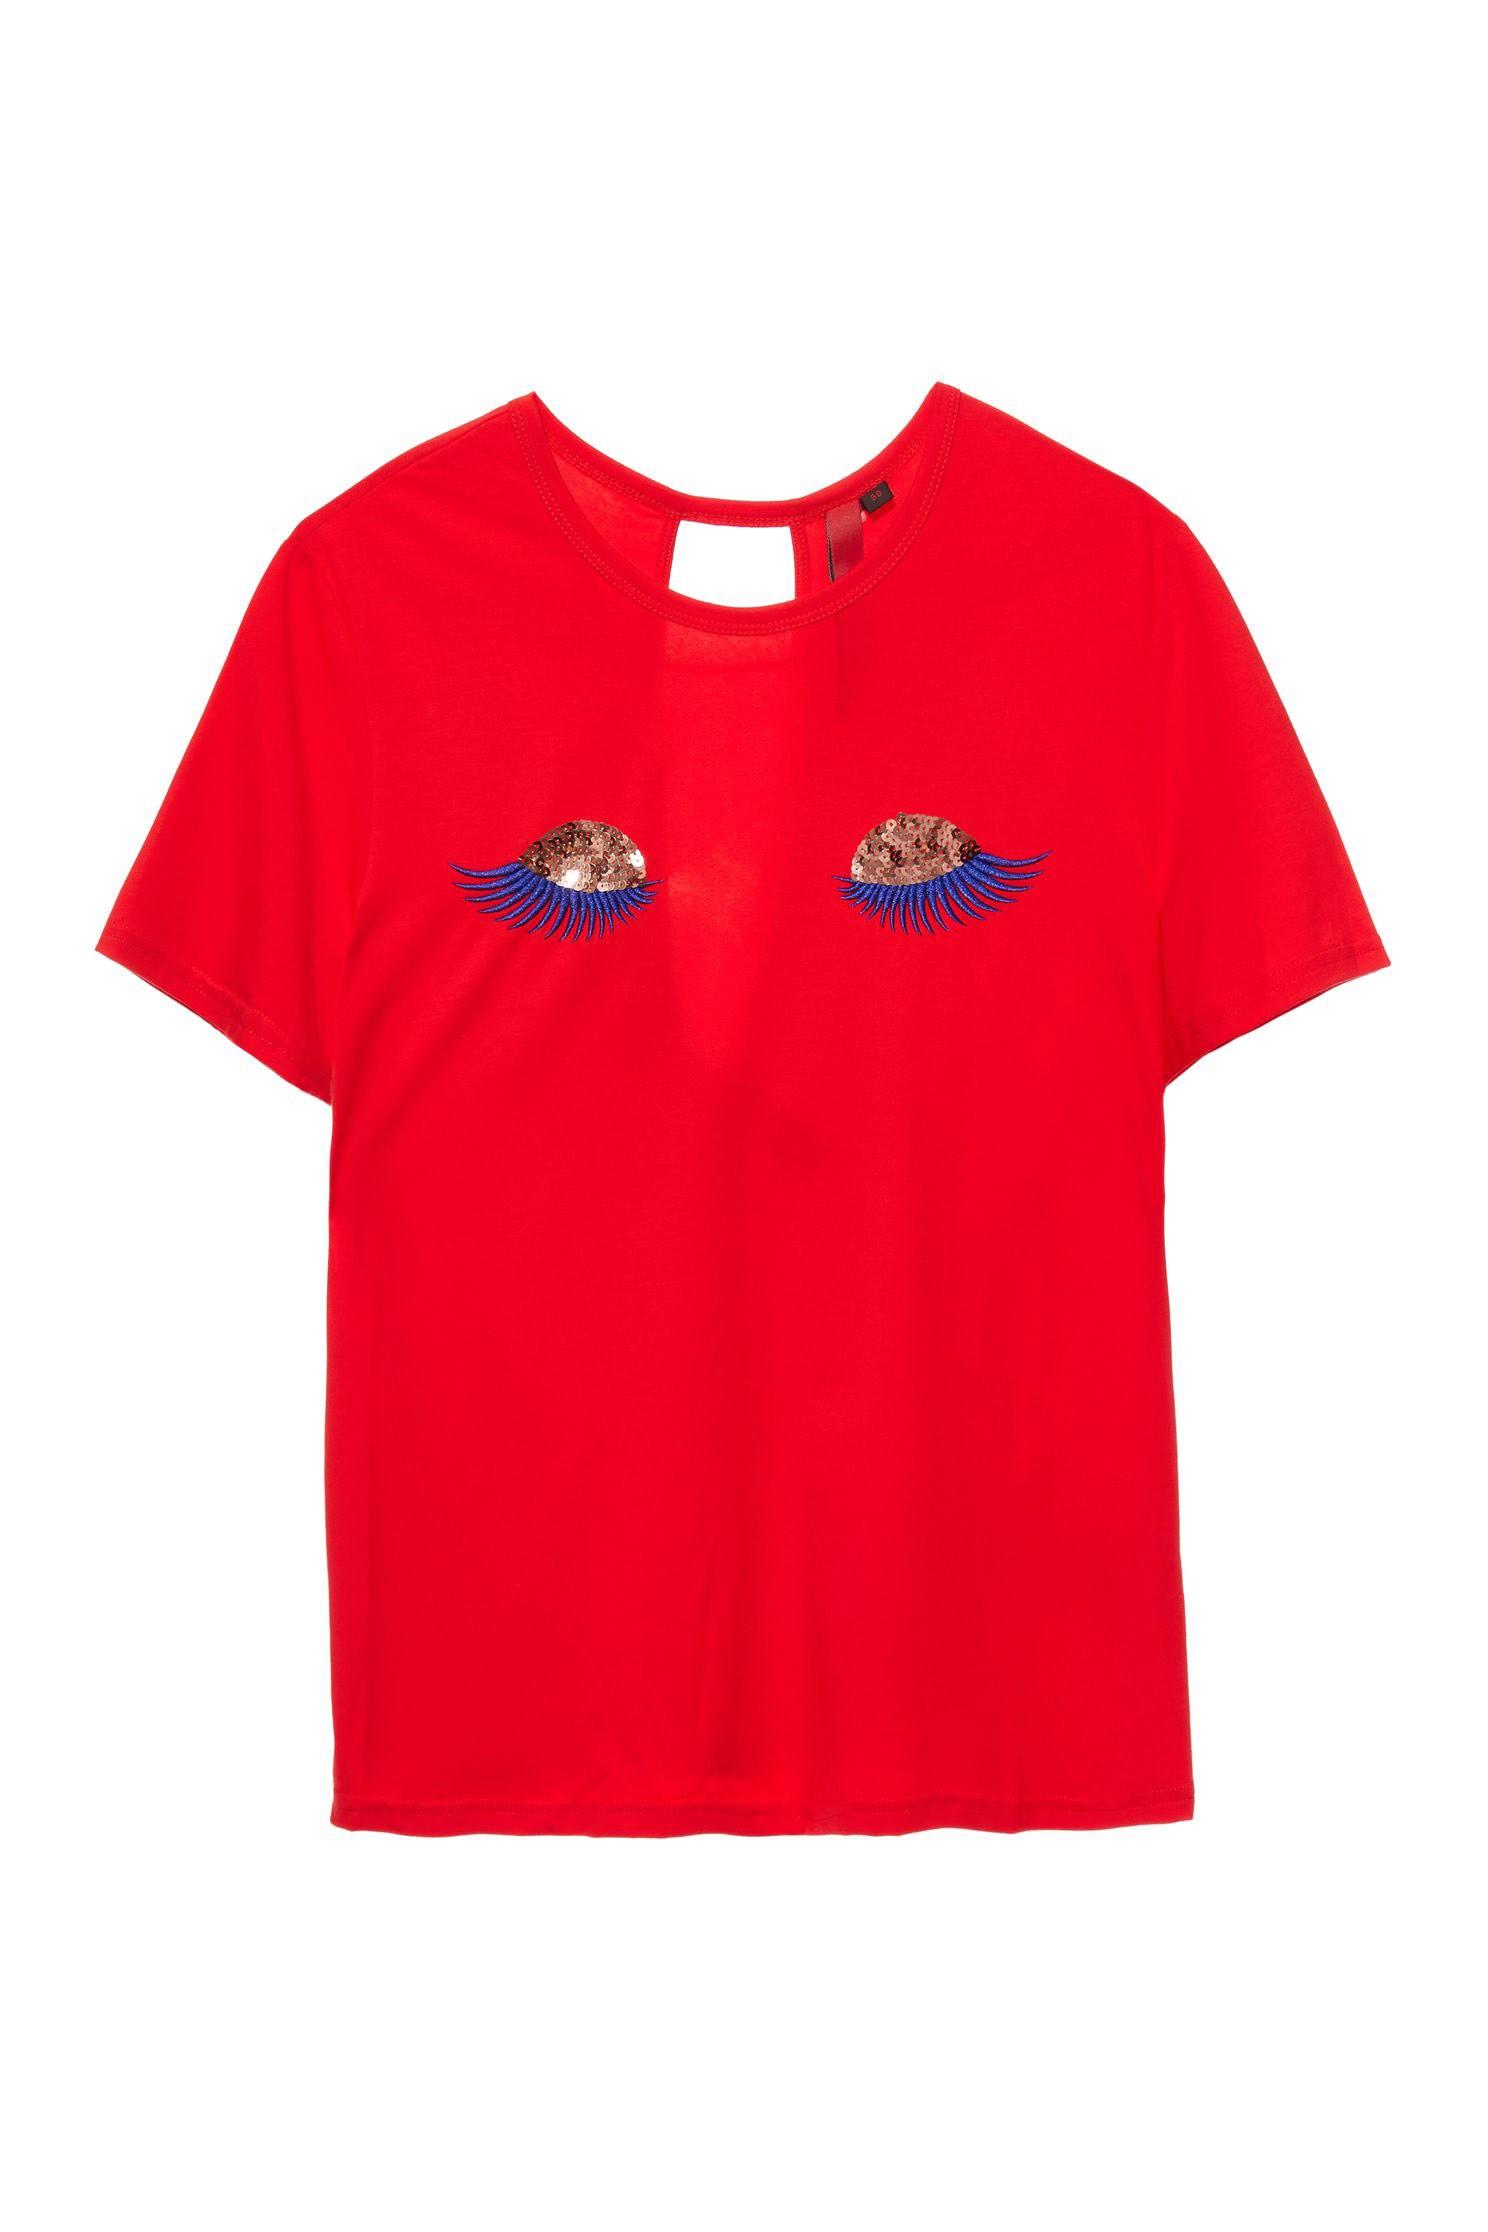 Round-collar eye embroidered T-shirt